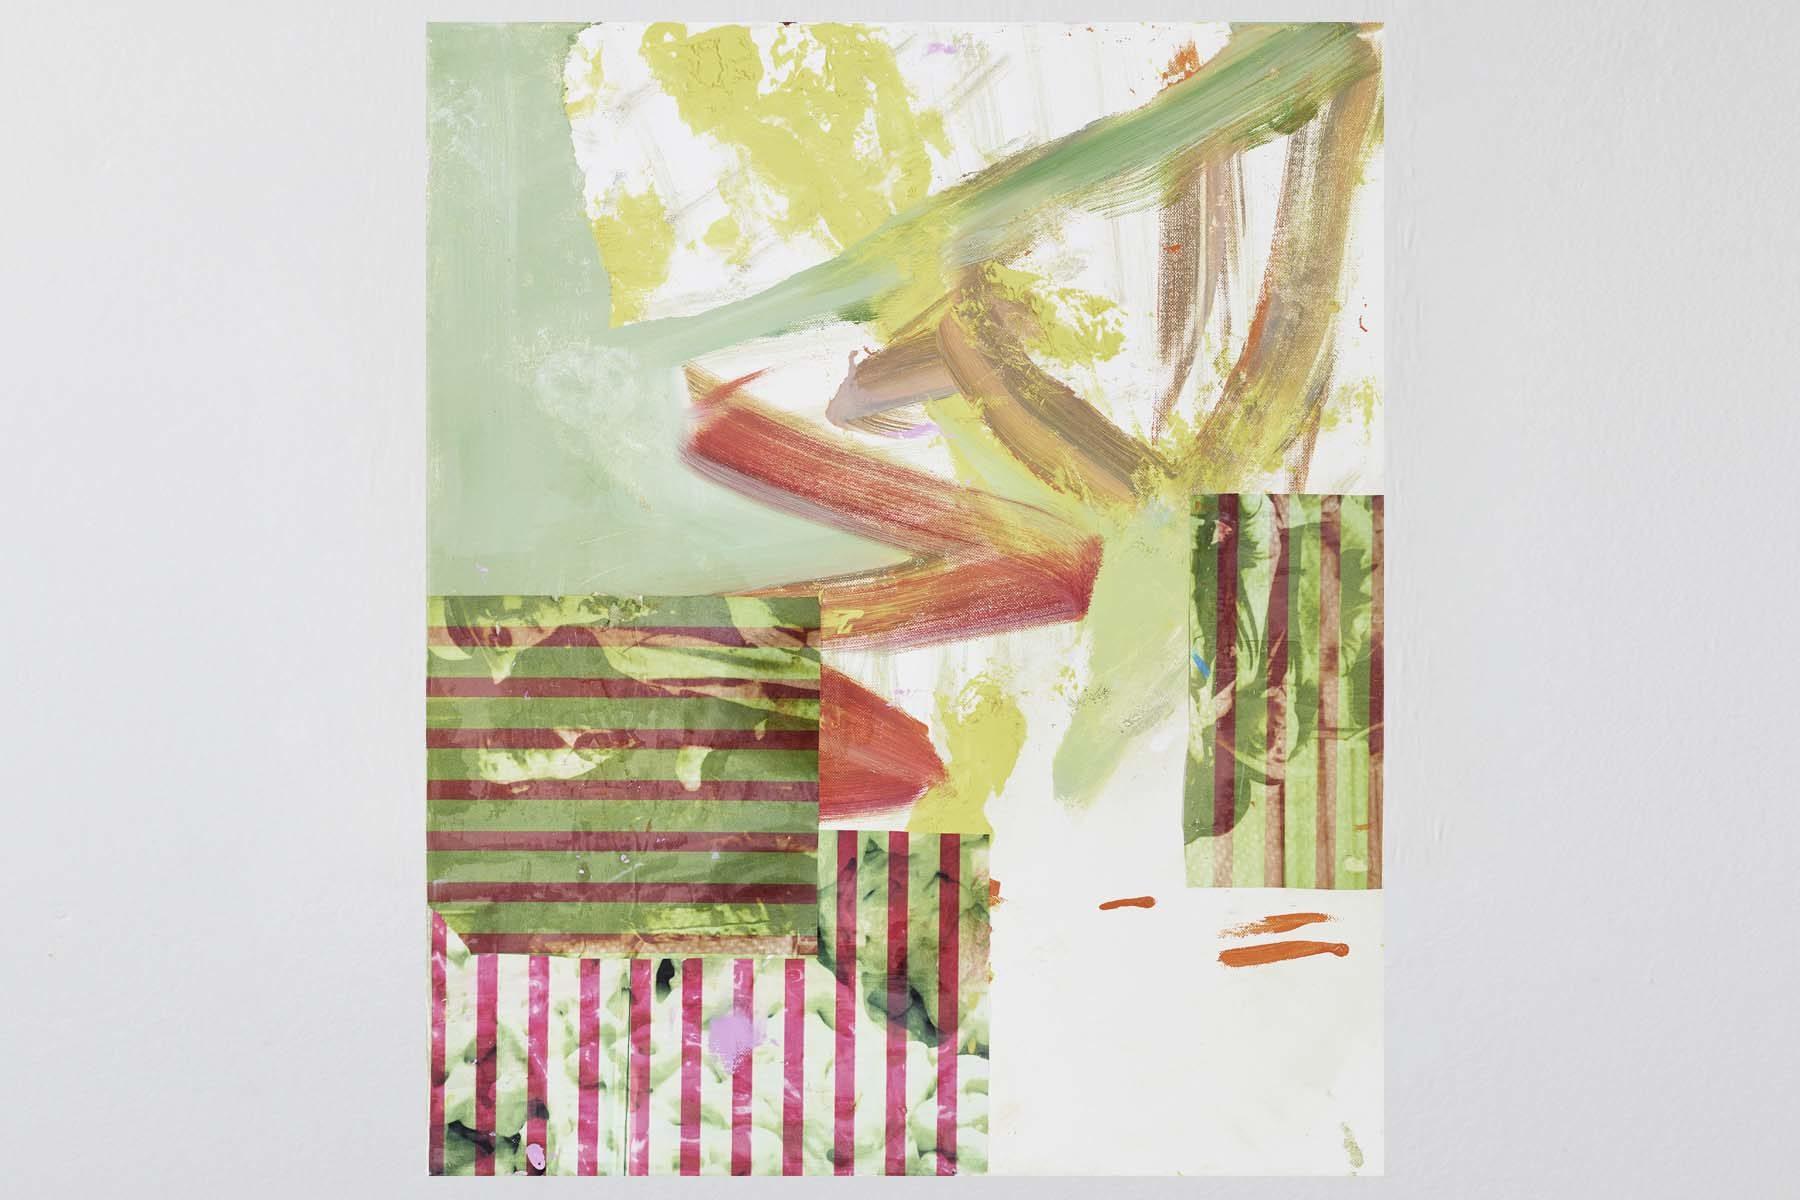 Andrea Plum, The locust, 2013, oil and paper on linen, 60 x 50 cm